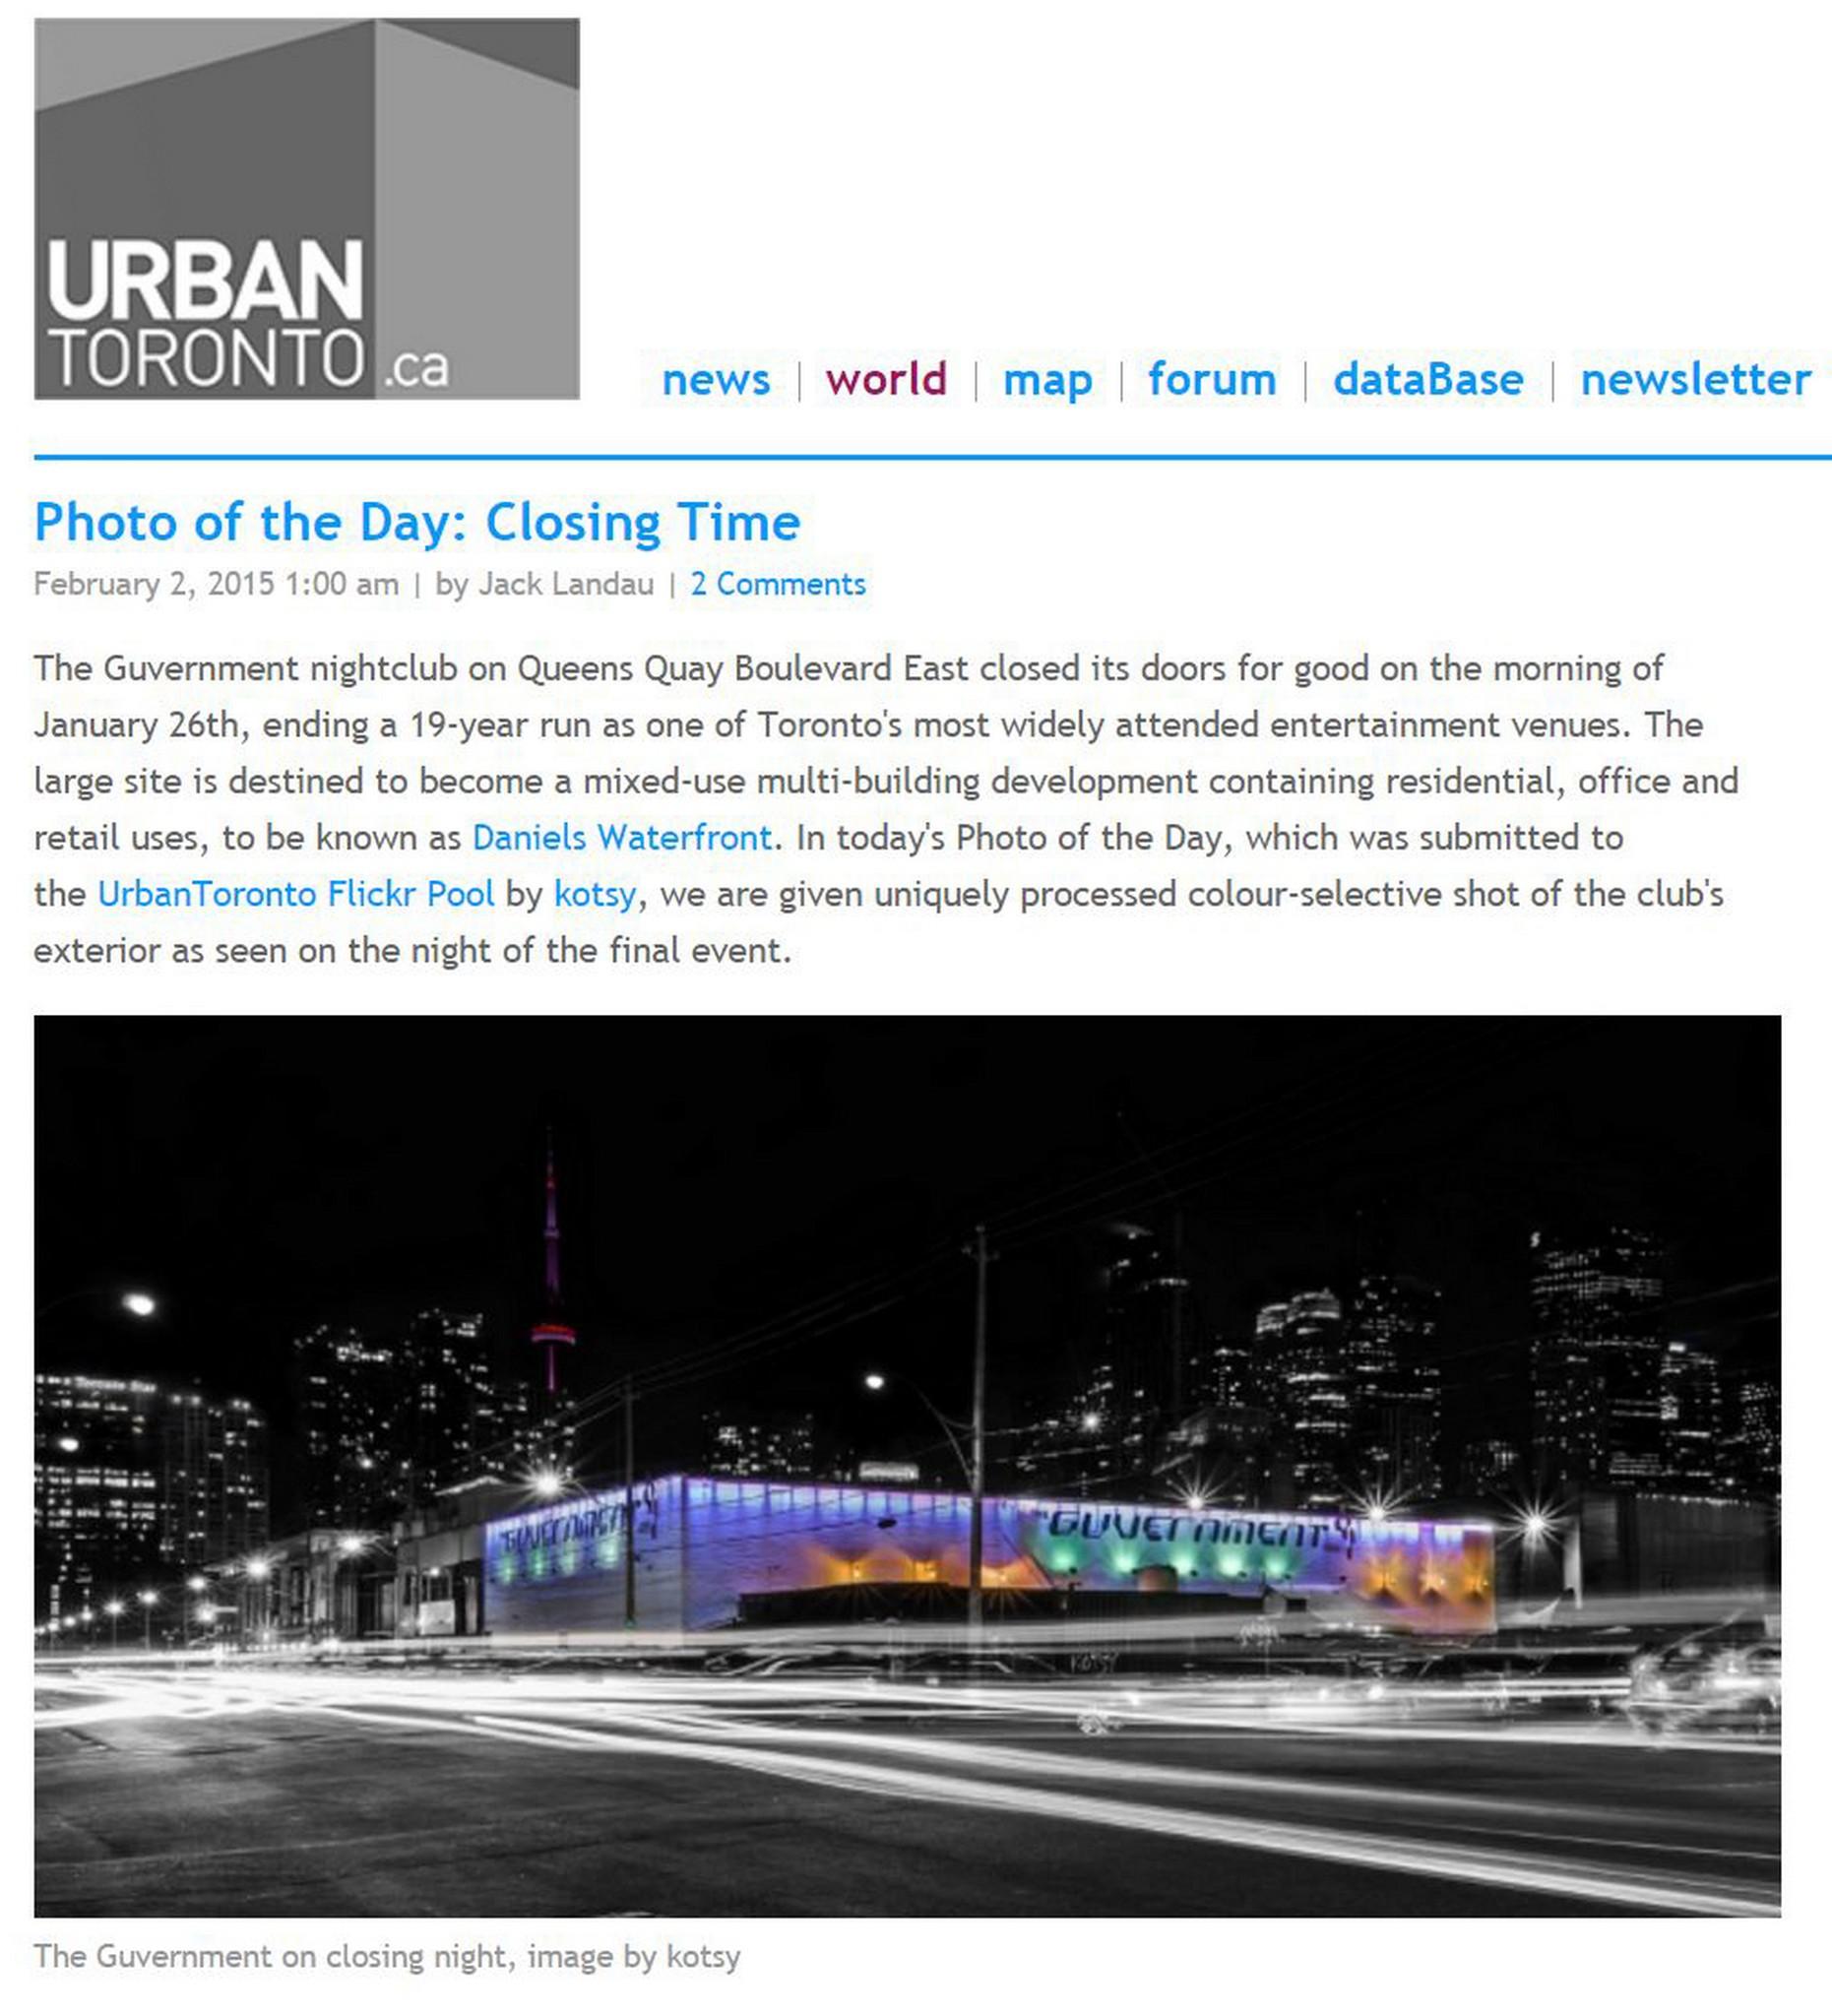 2015-02-15 - Urban Toronto.jpg